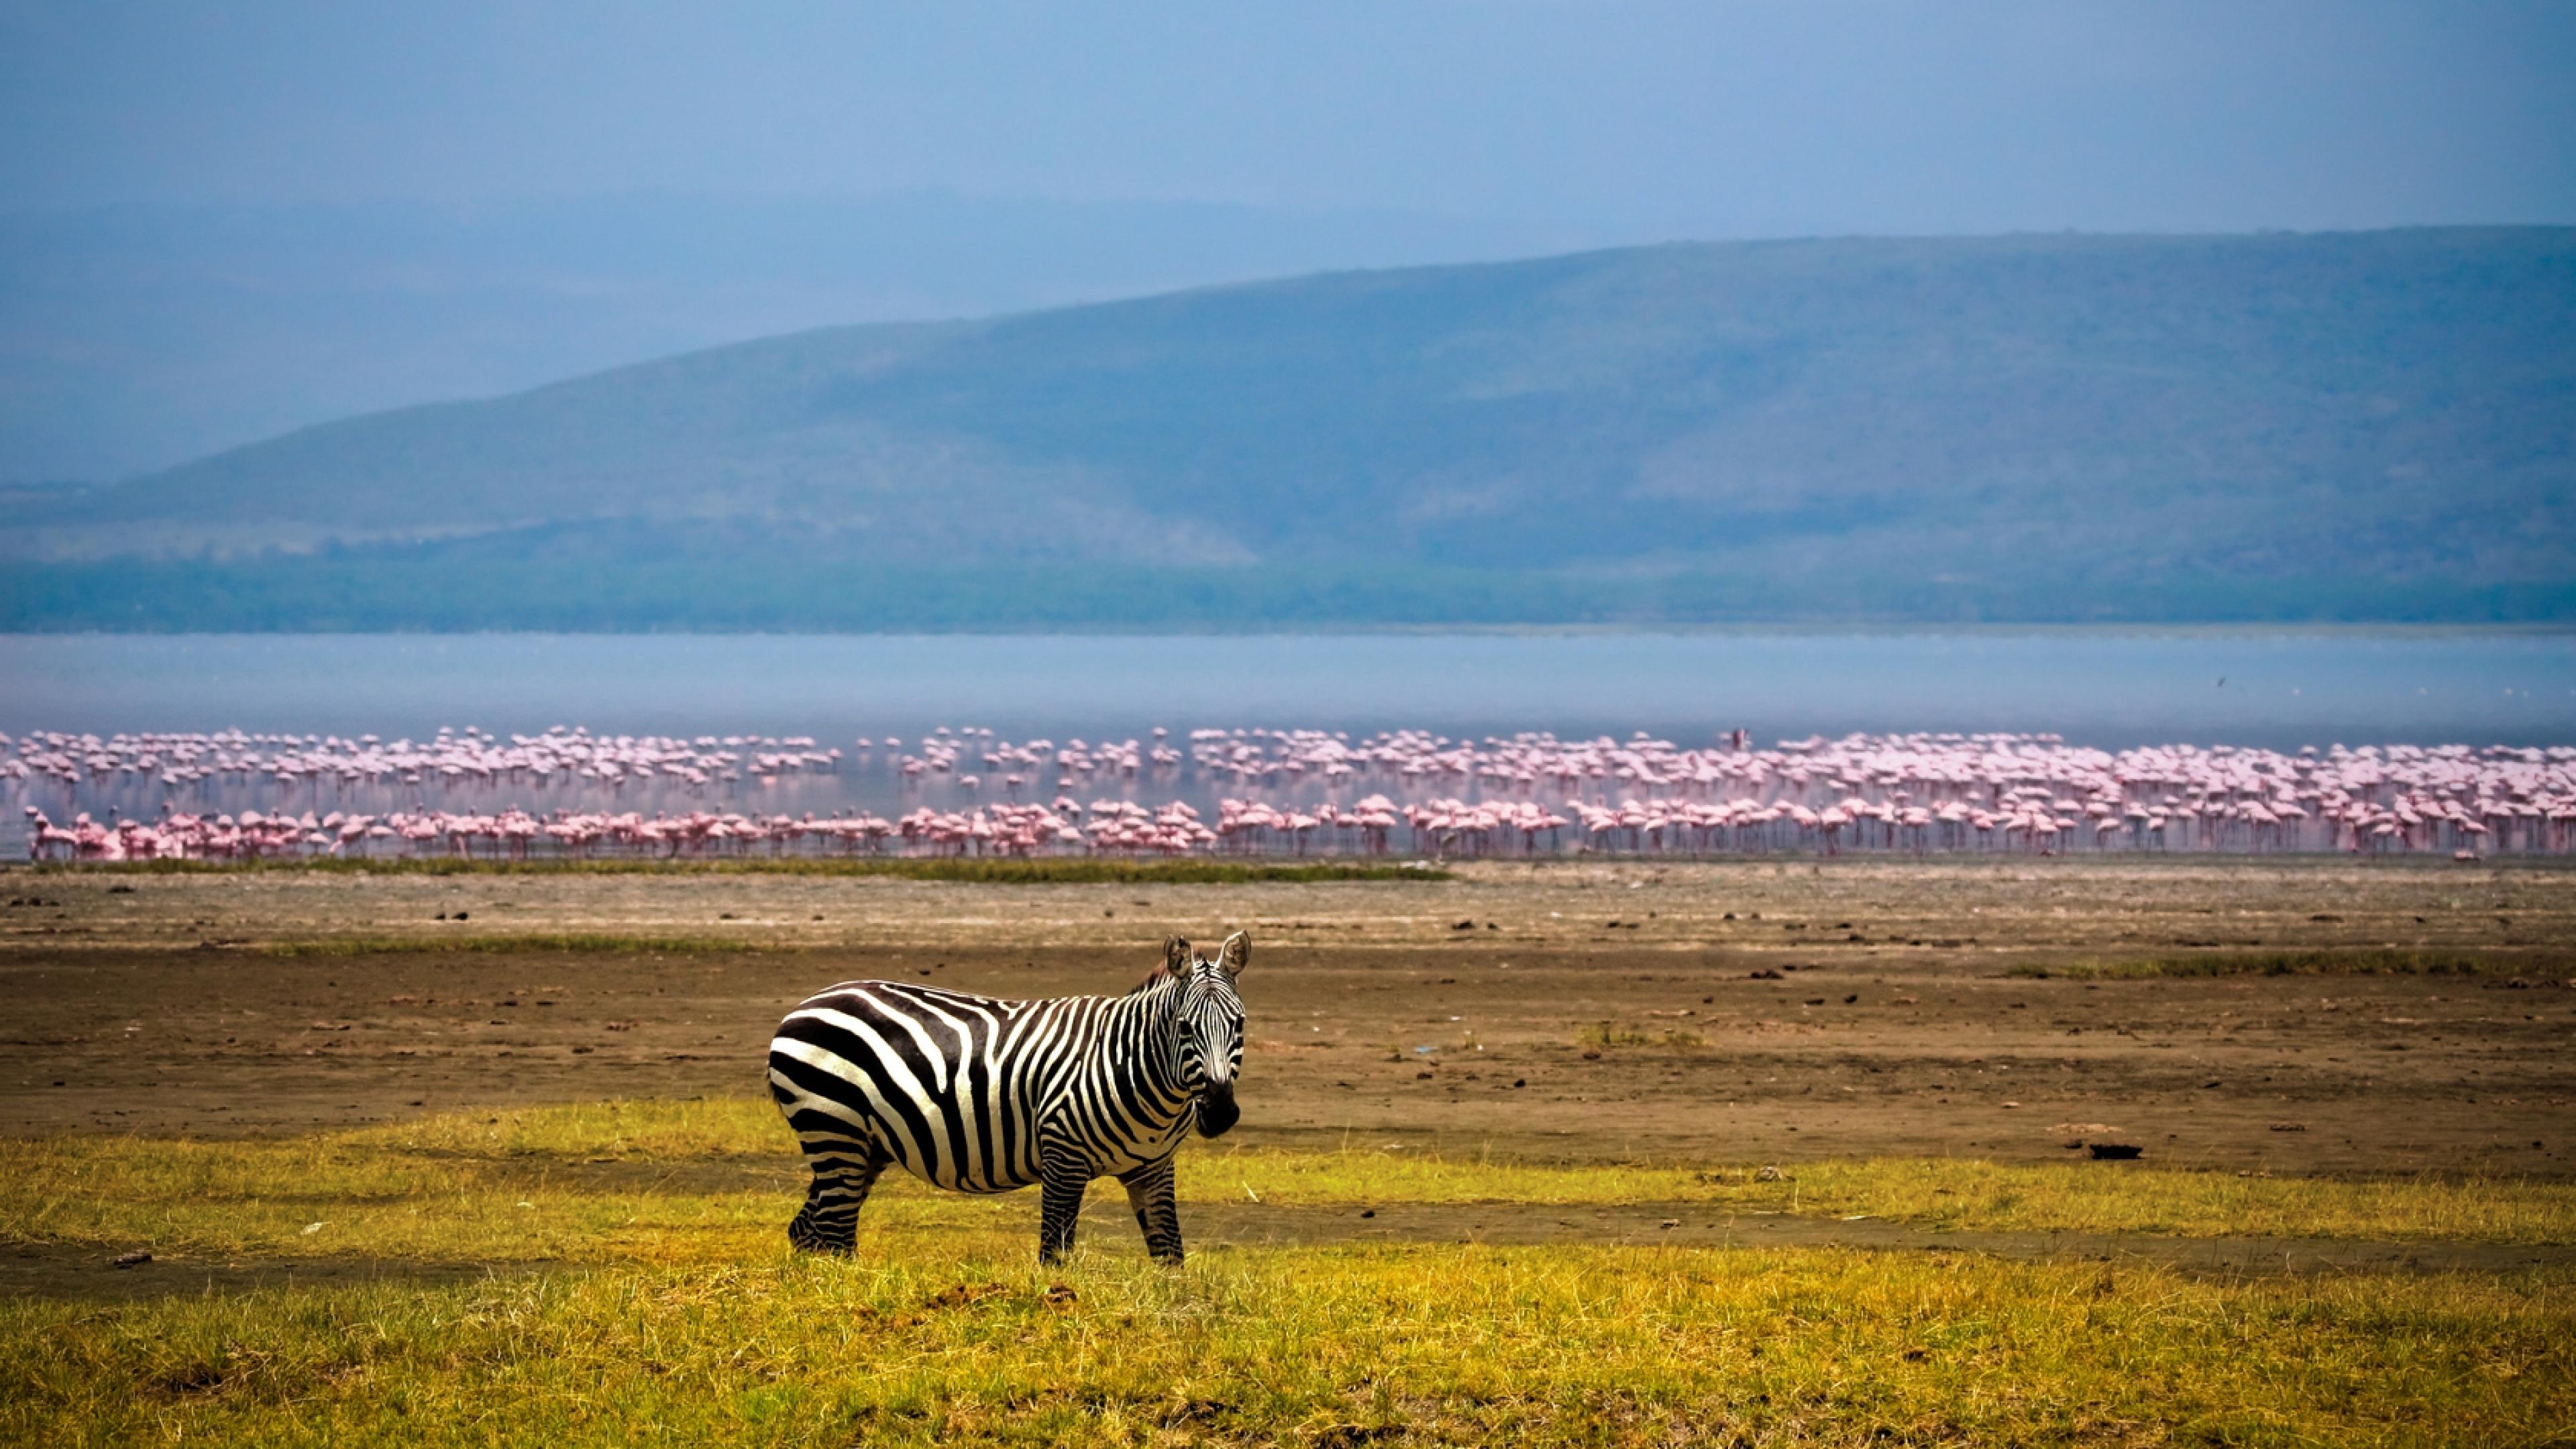 Africa Background Lake Flamingos Wallpaper Background 4K Ultra HD 3840x2160